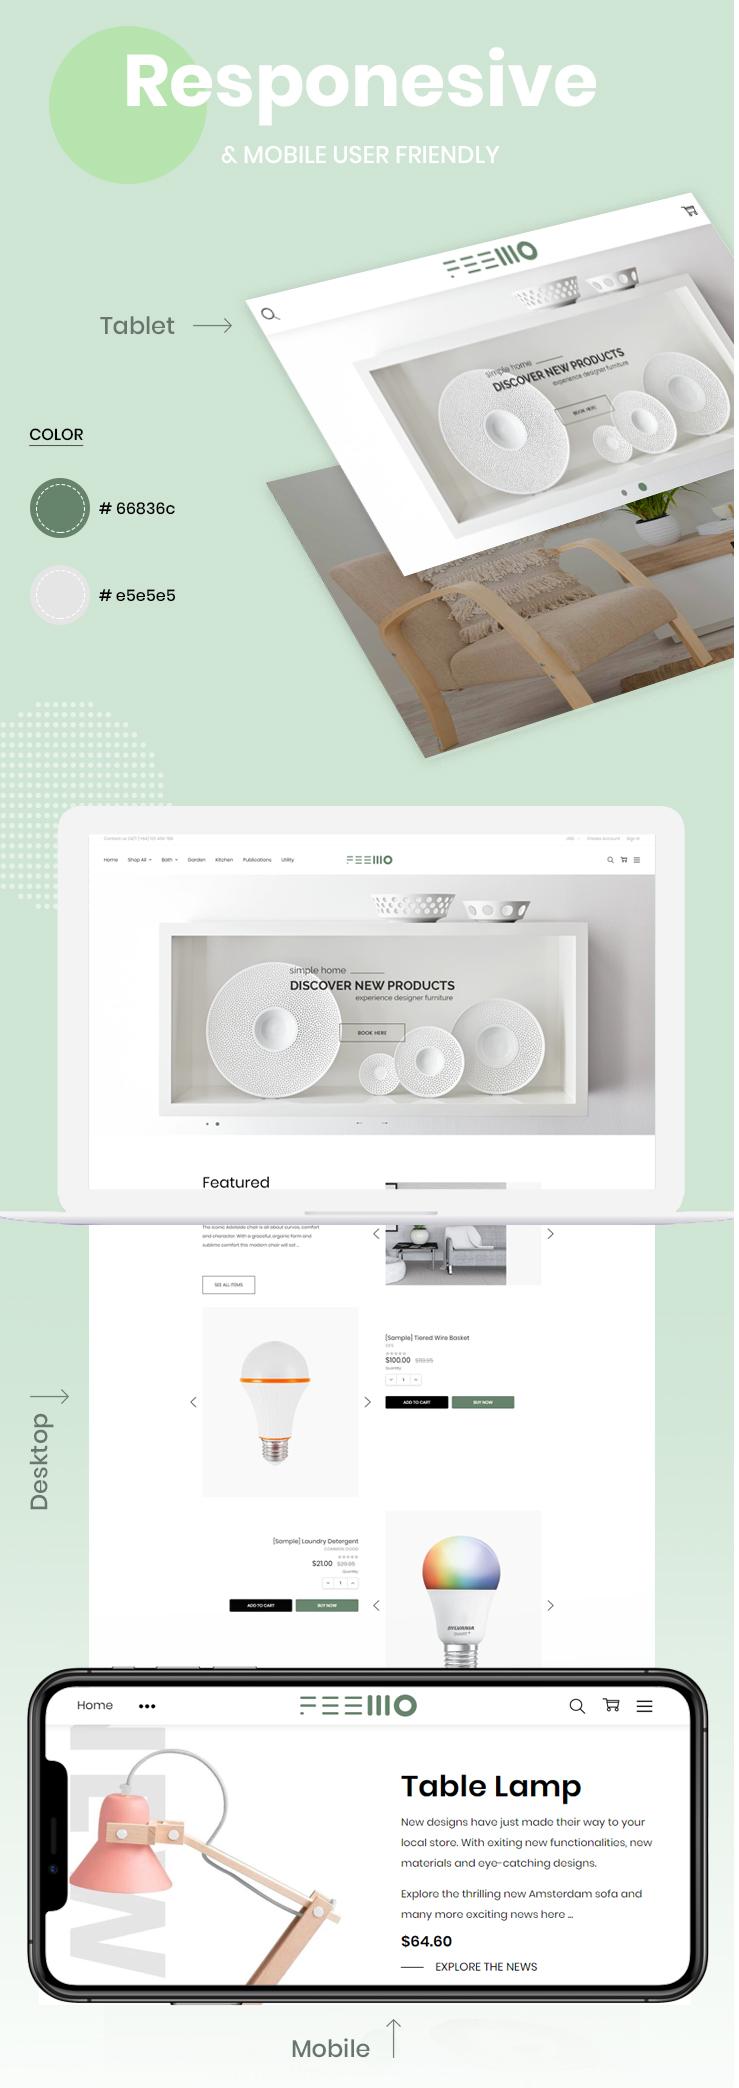 bc-feellio-furniturer-01.jpg